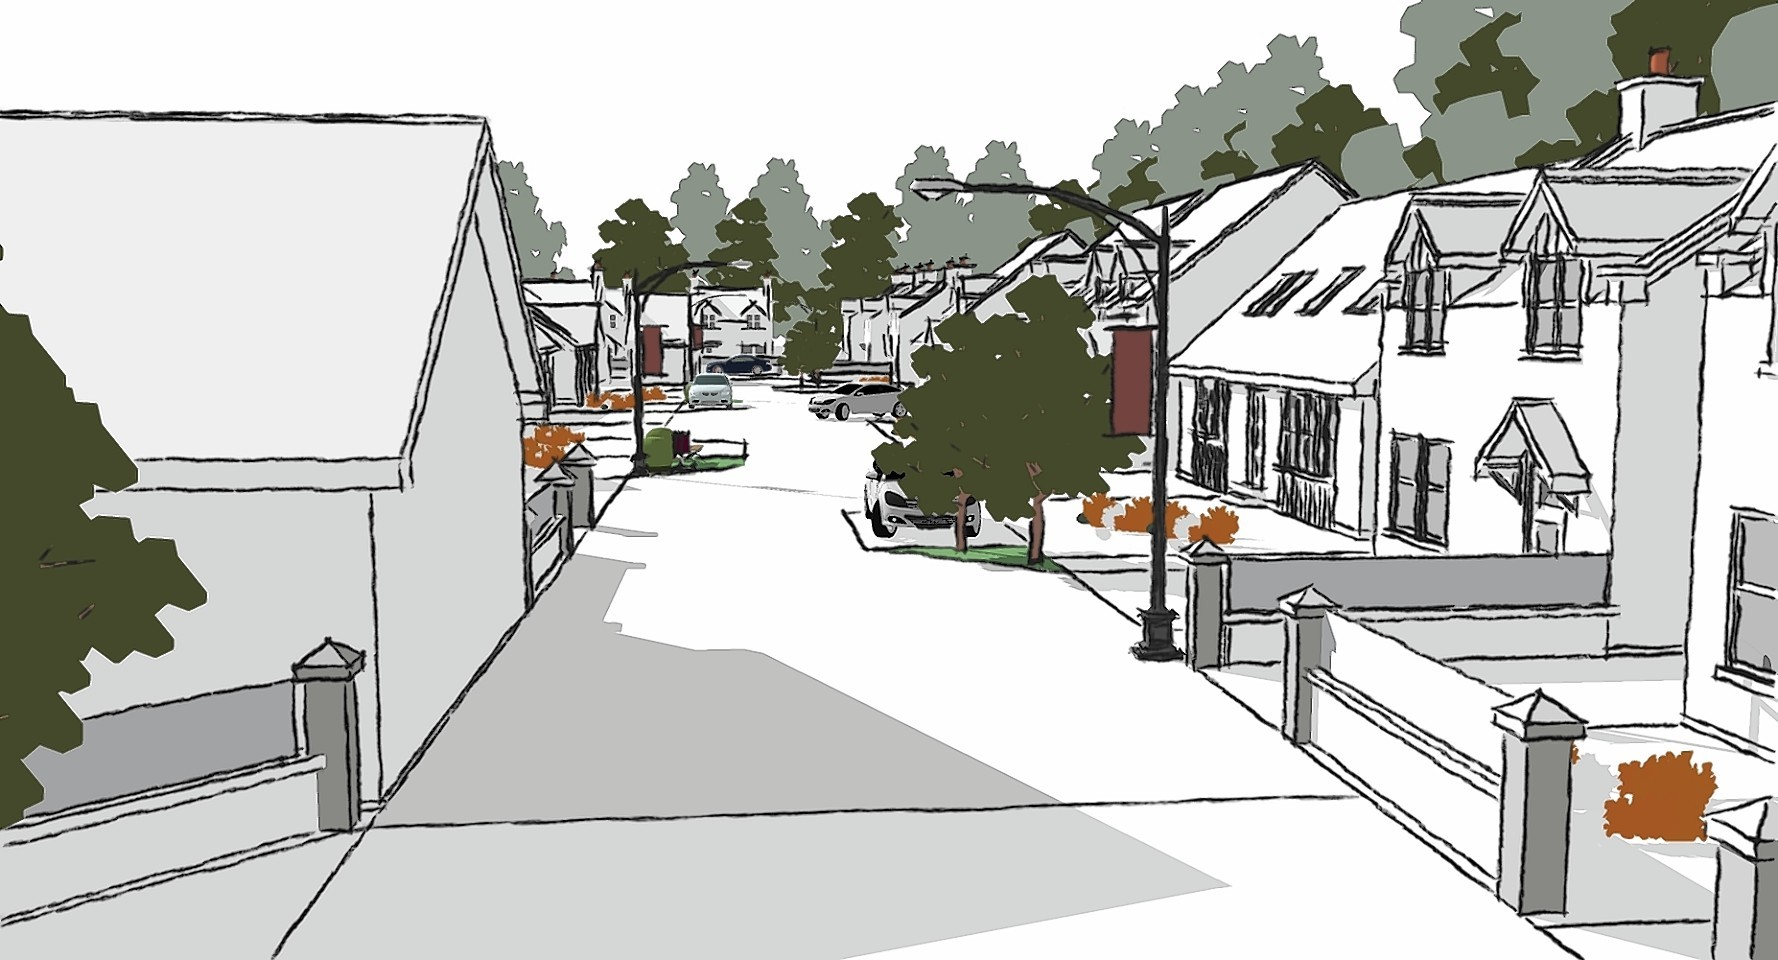 Artist's impression of the Clerkhill development, Peterhead